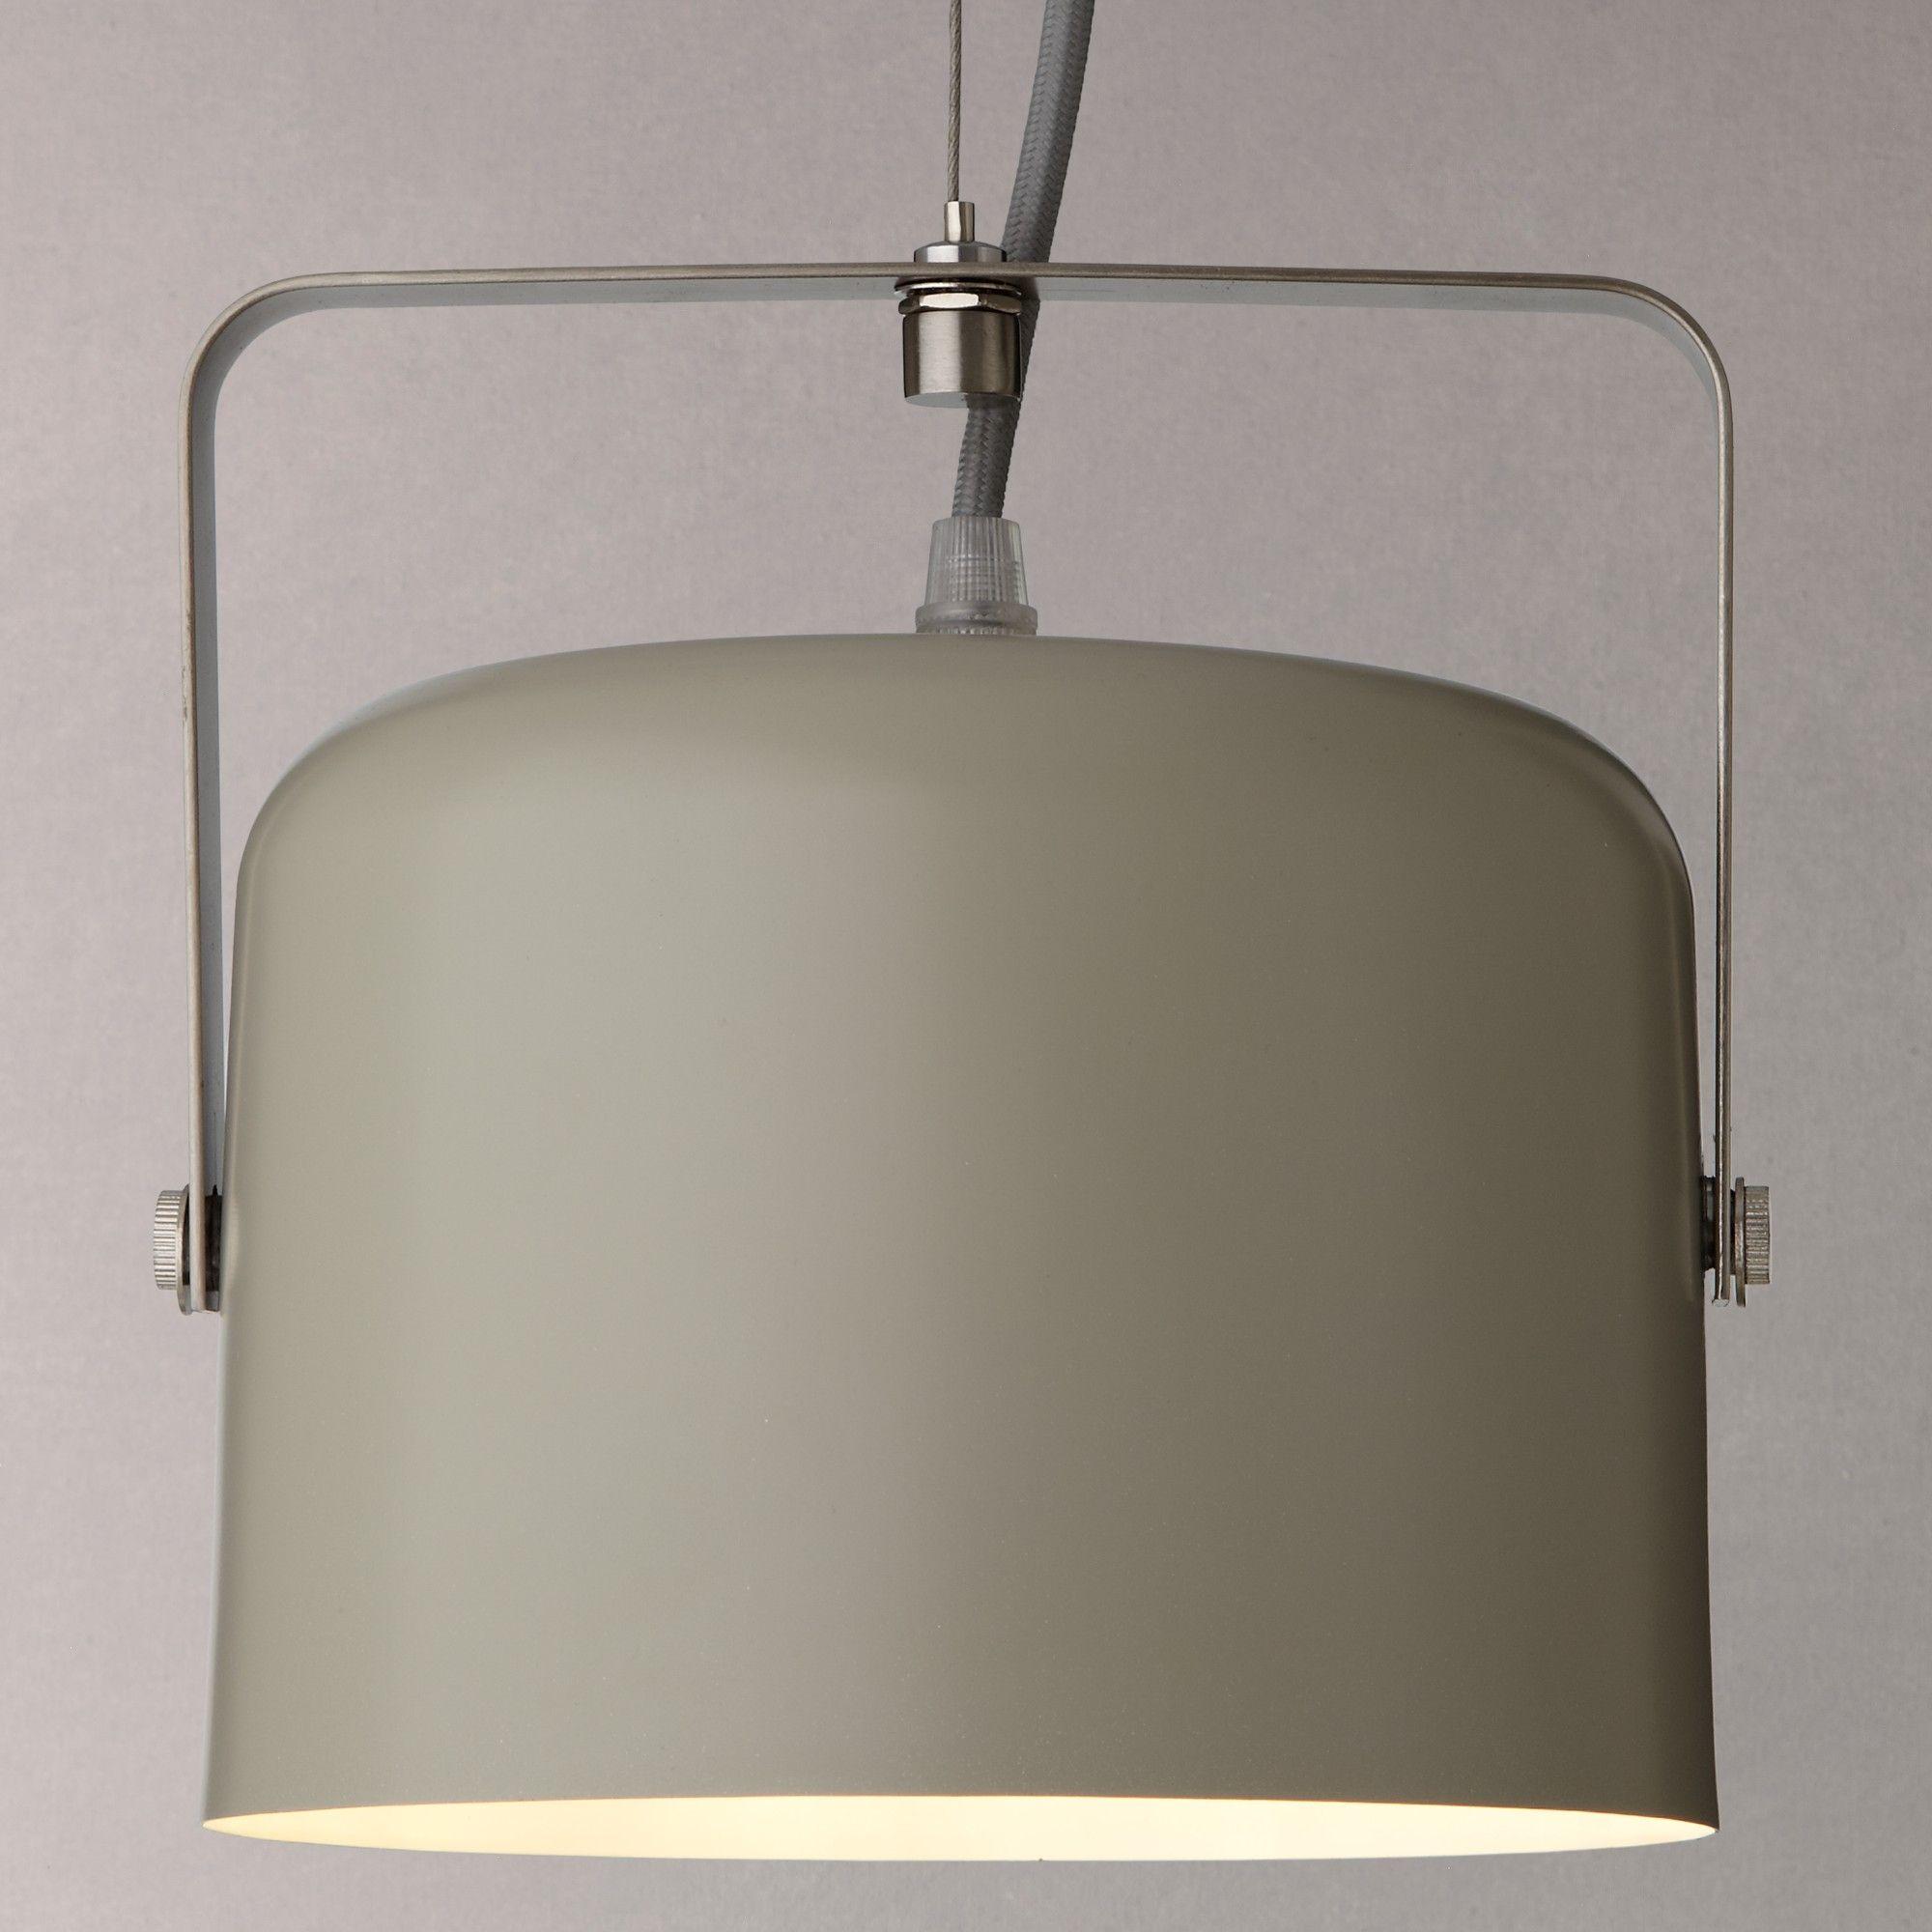 John Lewis Bjorn Single Flood Ceiling Light, Putty